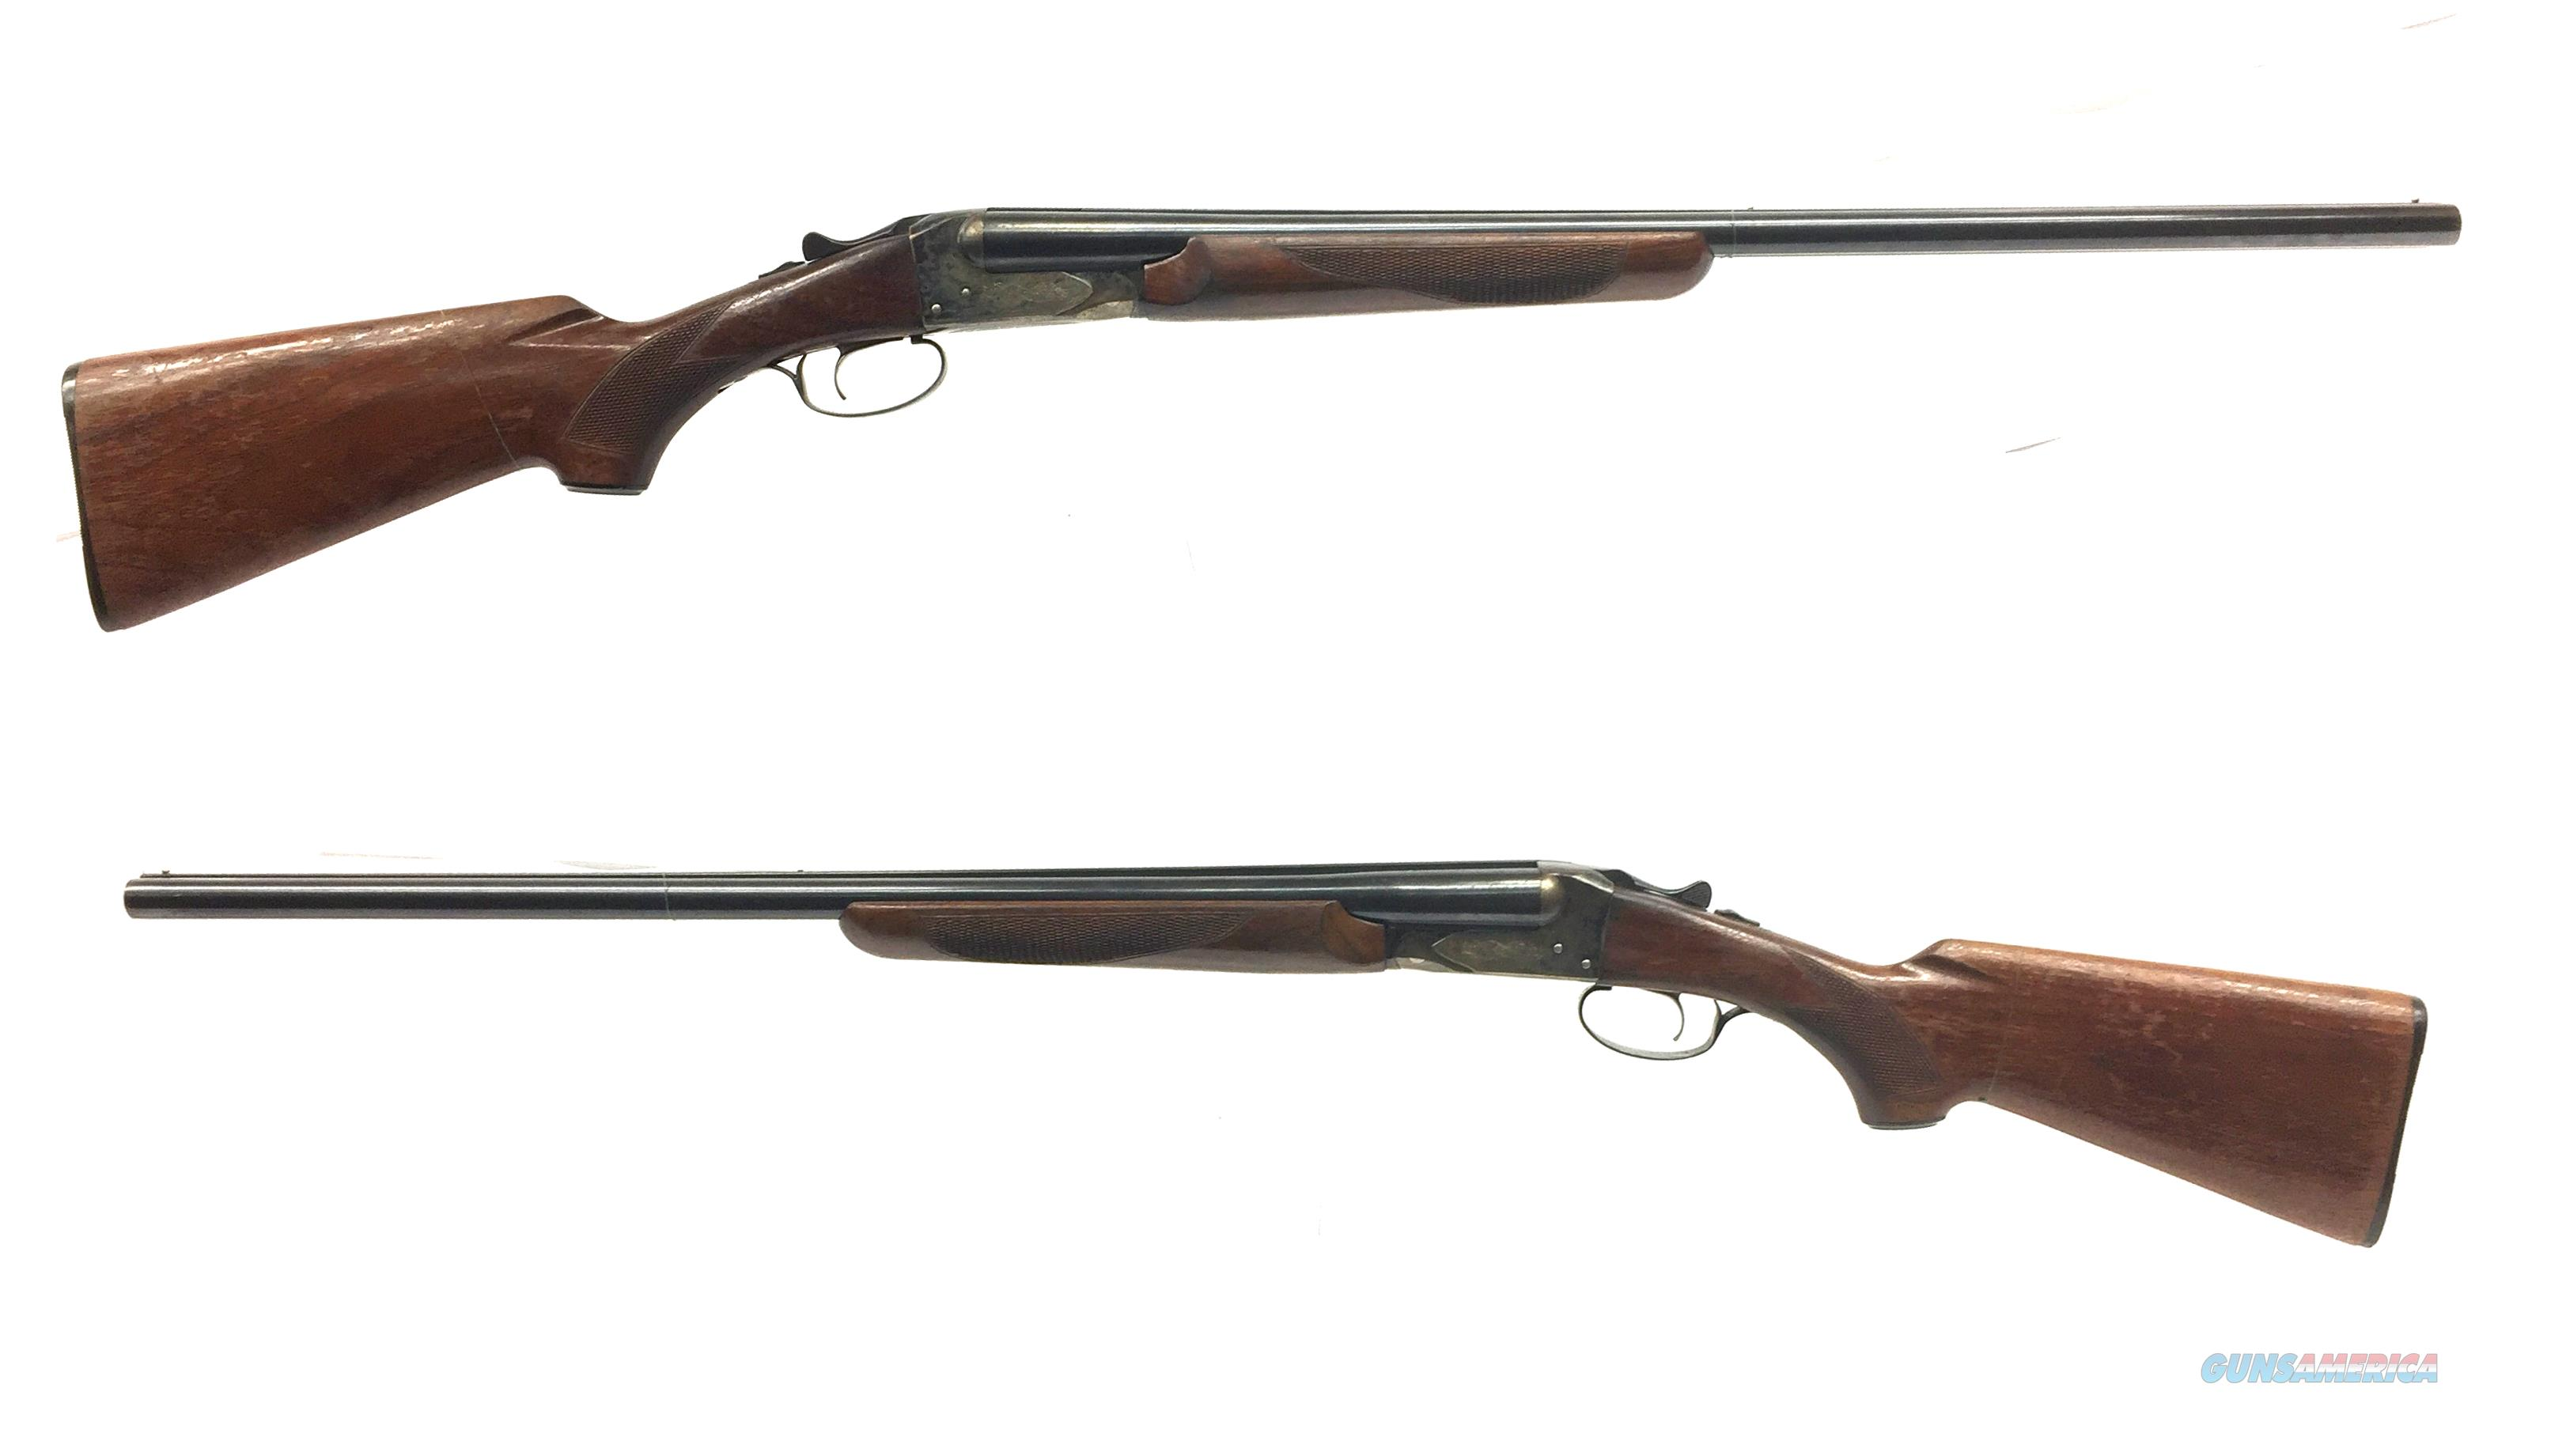 /UserImages/120038/987168444 10978760.jpg. Description: Savage Arms Fox  Model B ...